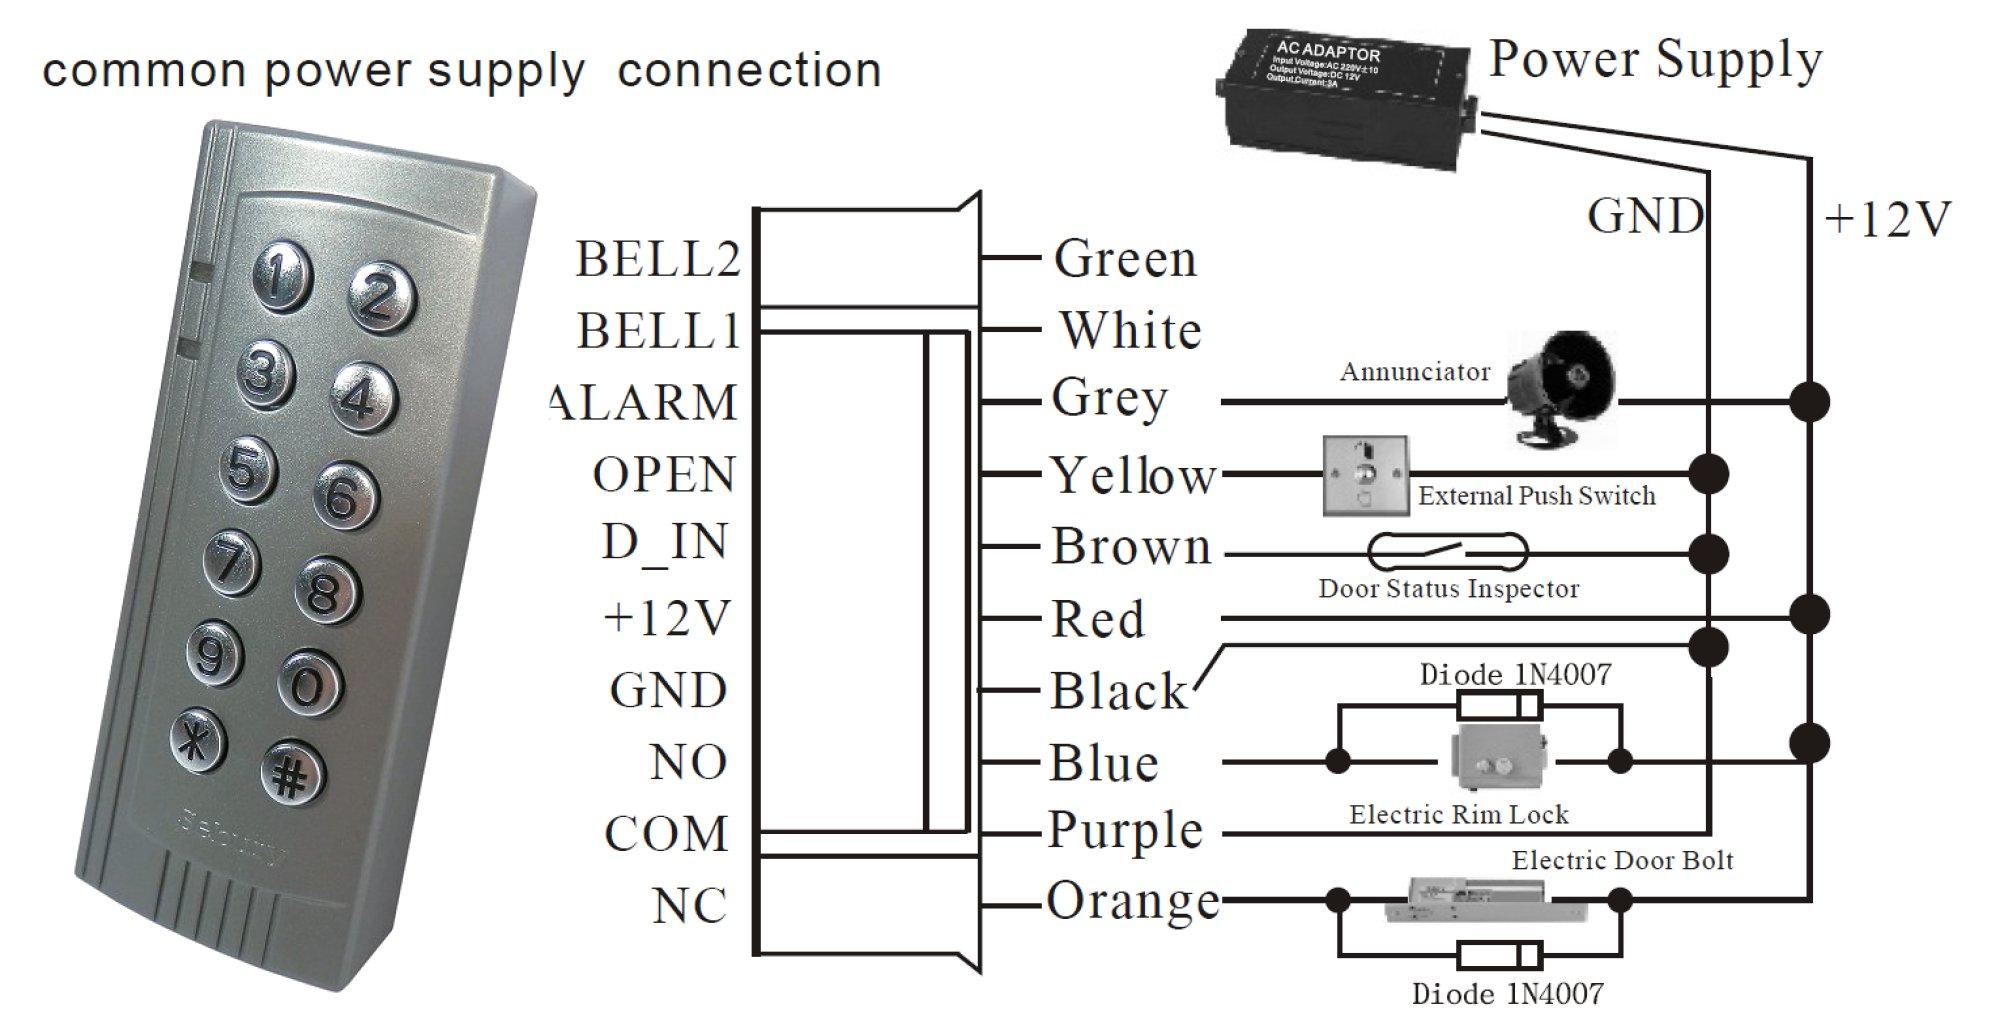 electronic door lock wiring diagram 96 jeep grand cherokee stereo sebury k4 access control digital keypad not membrane